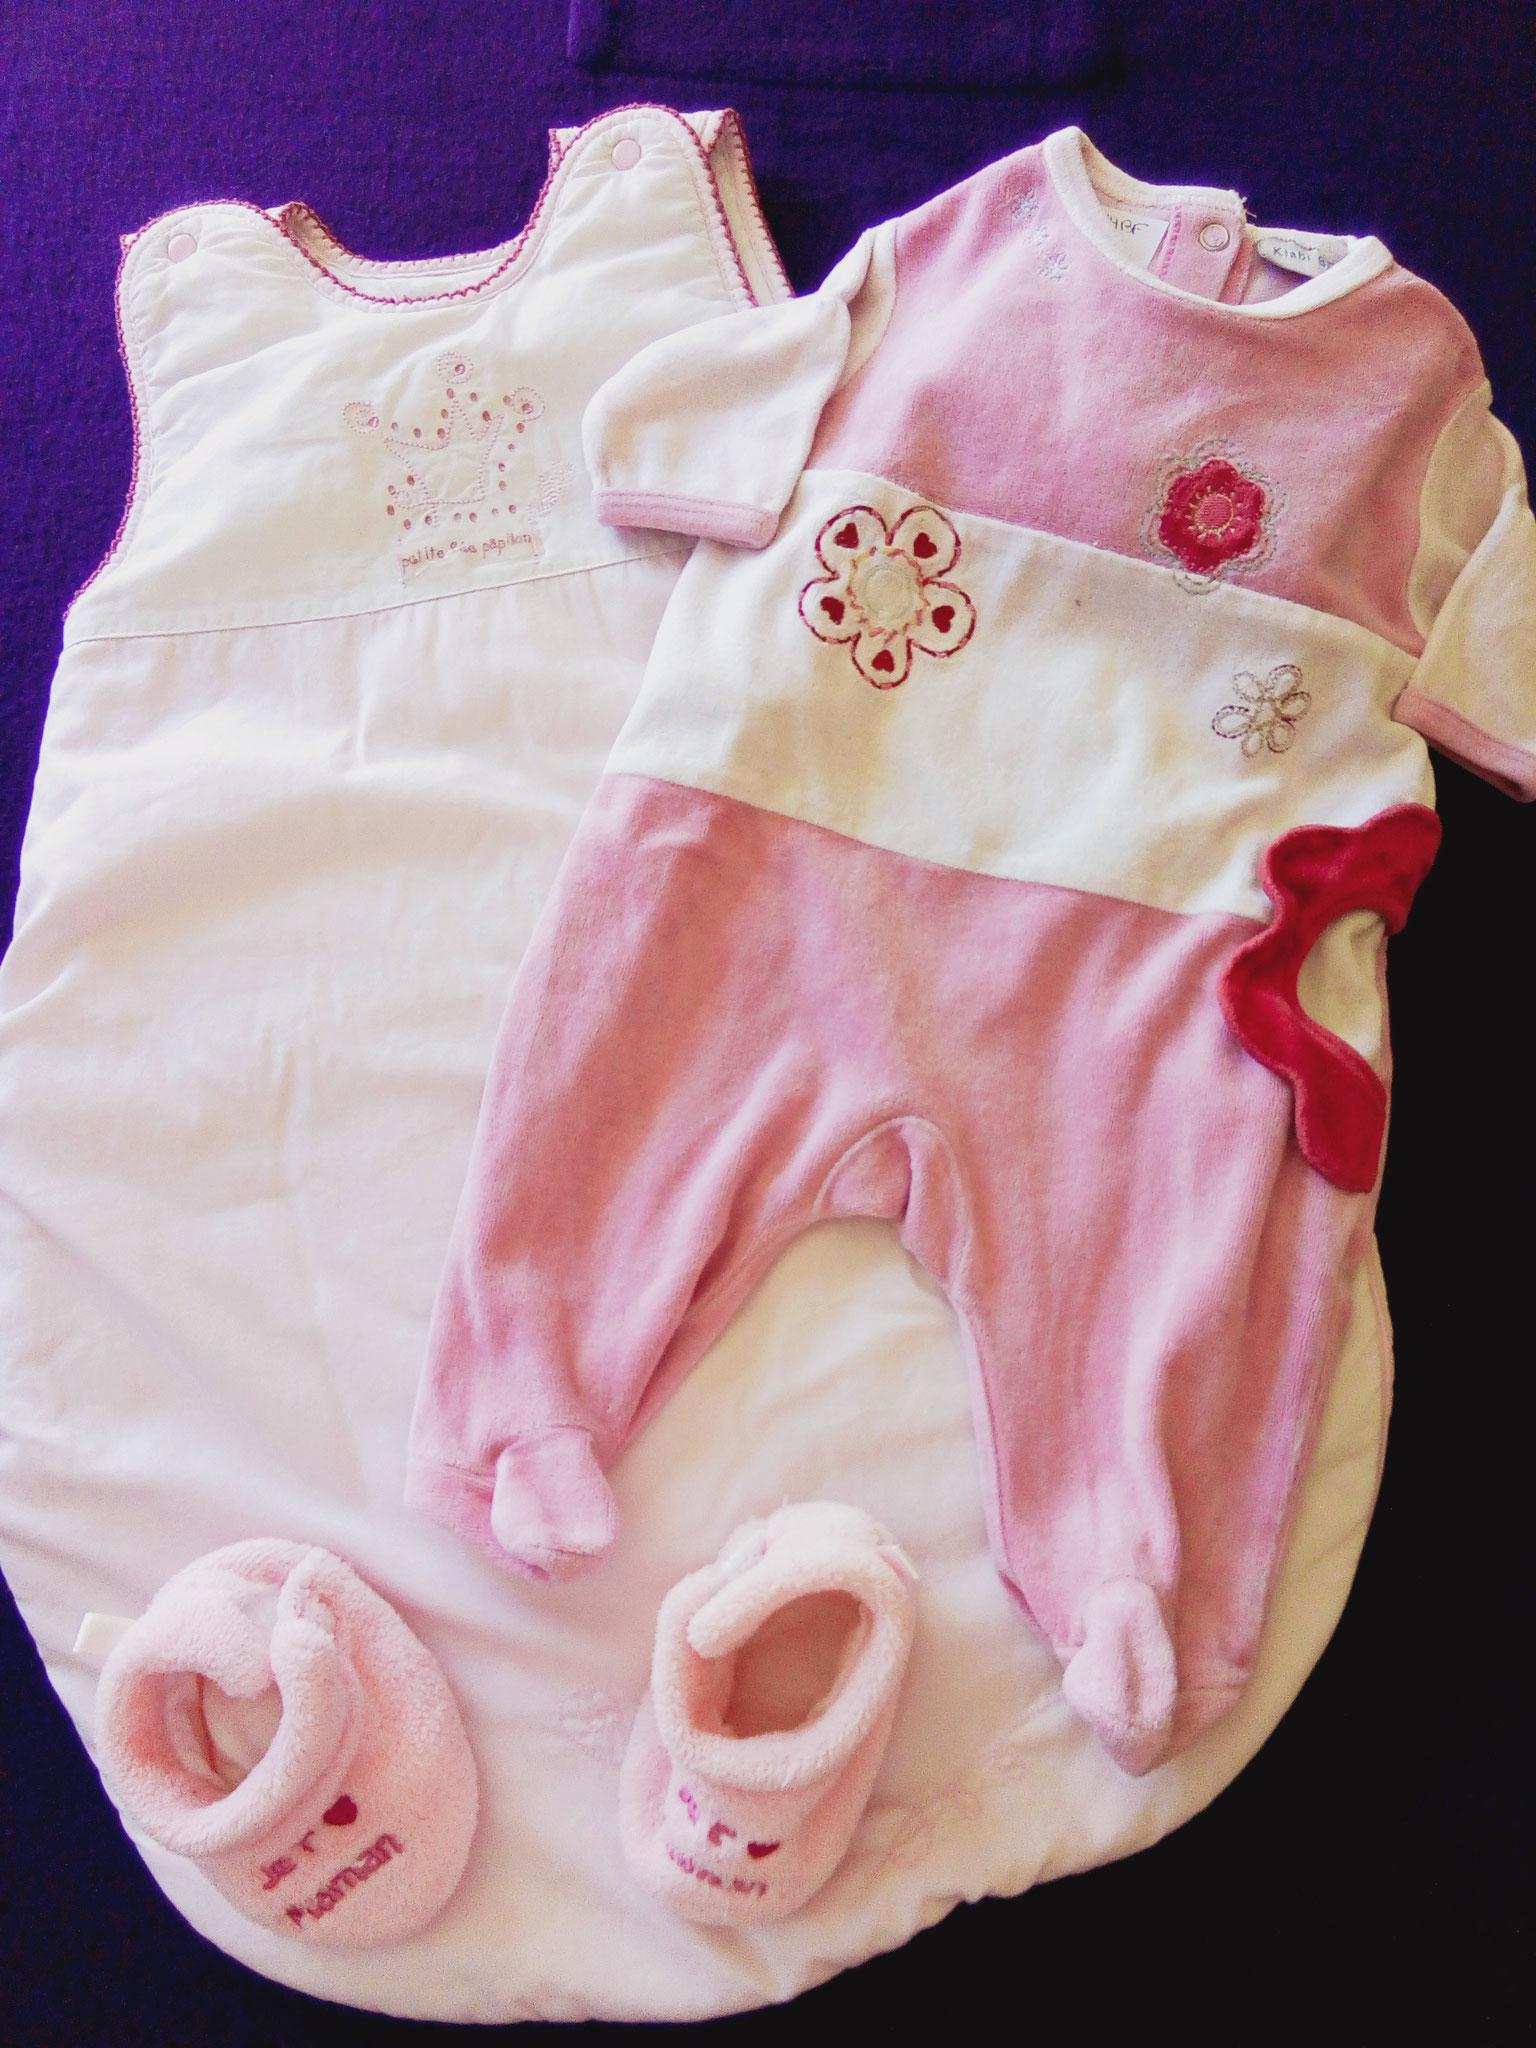 Ensemble gigoteuse et pyjama avec chaussons 1er âge.  rose.